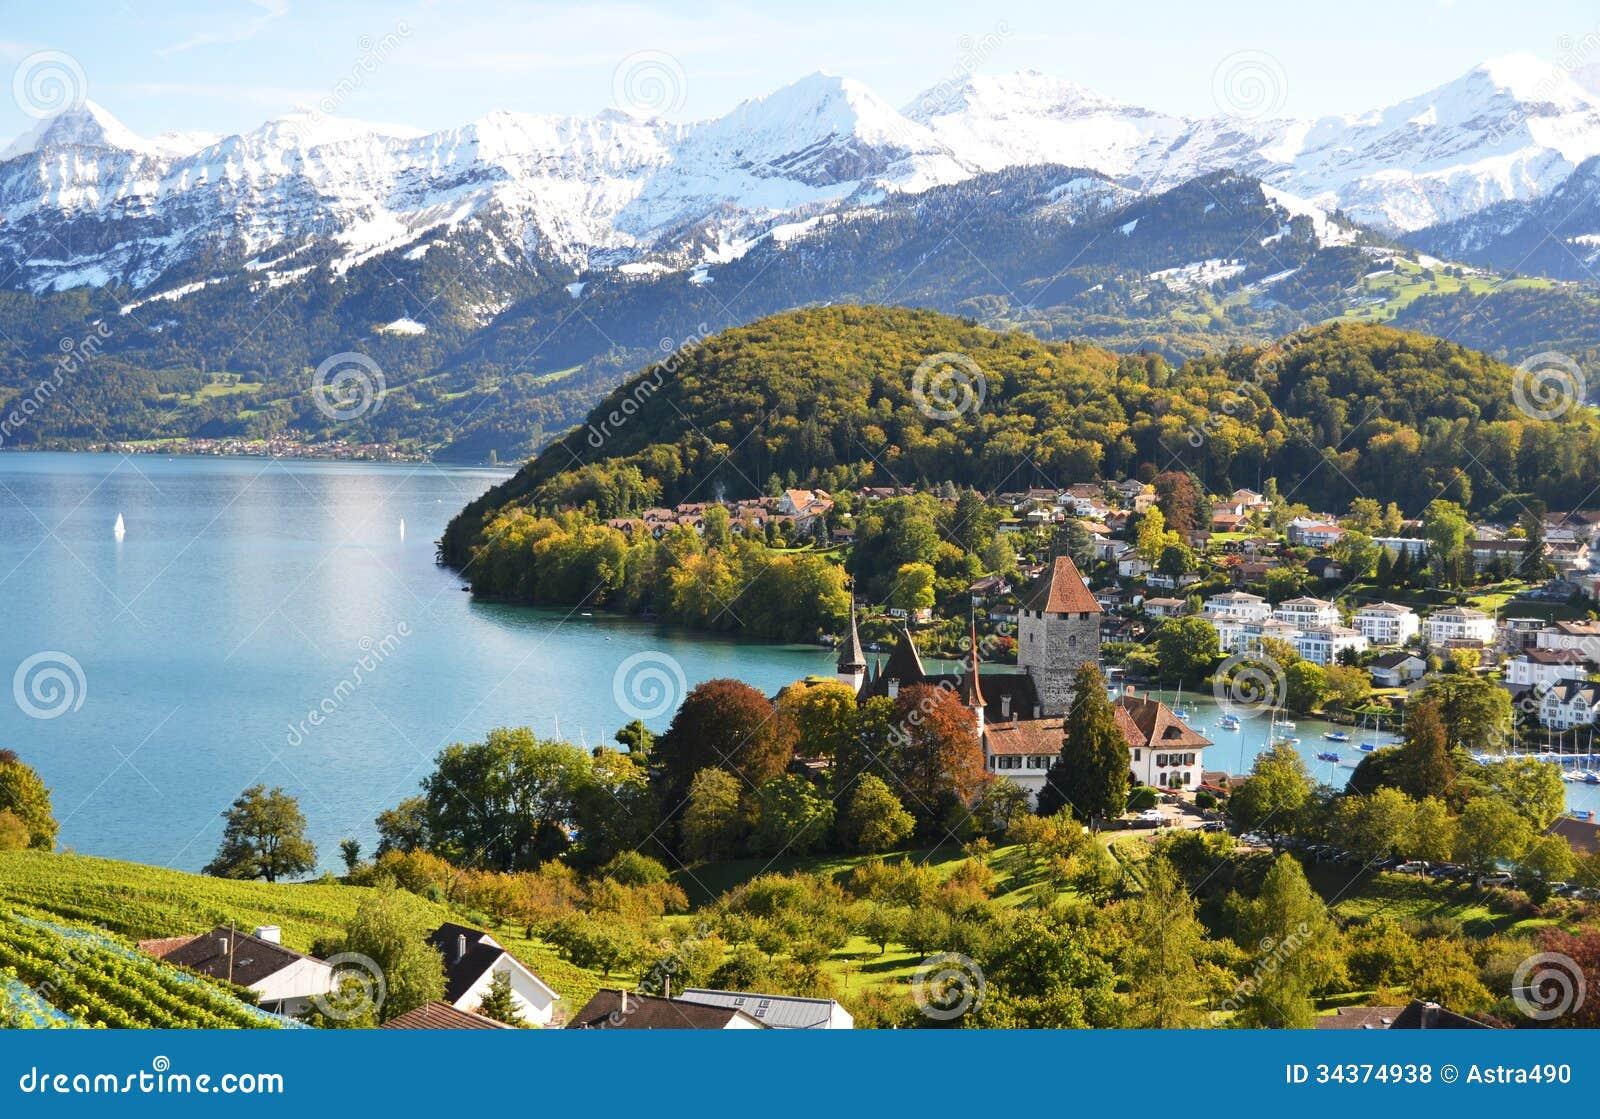 Spiez Switzerland  City new picture : Spiez Castle, Switzerland Royalty Free Stock Photos Image: 34374938